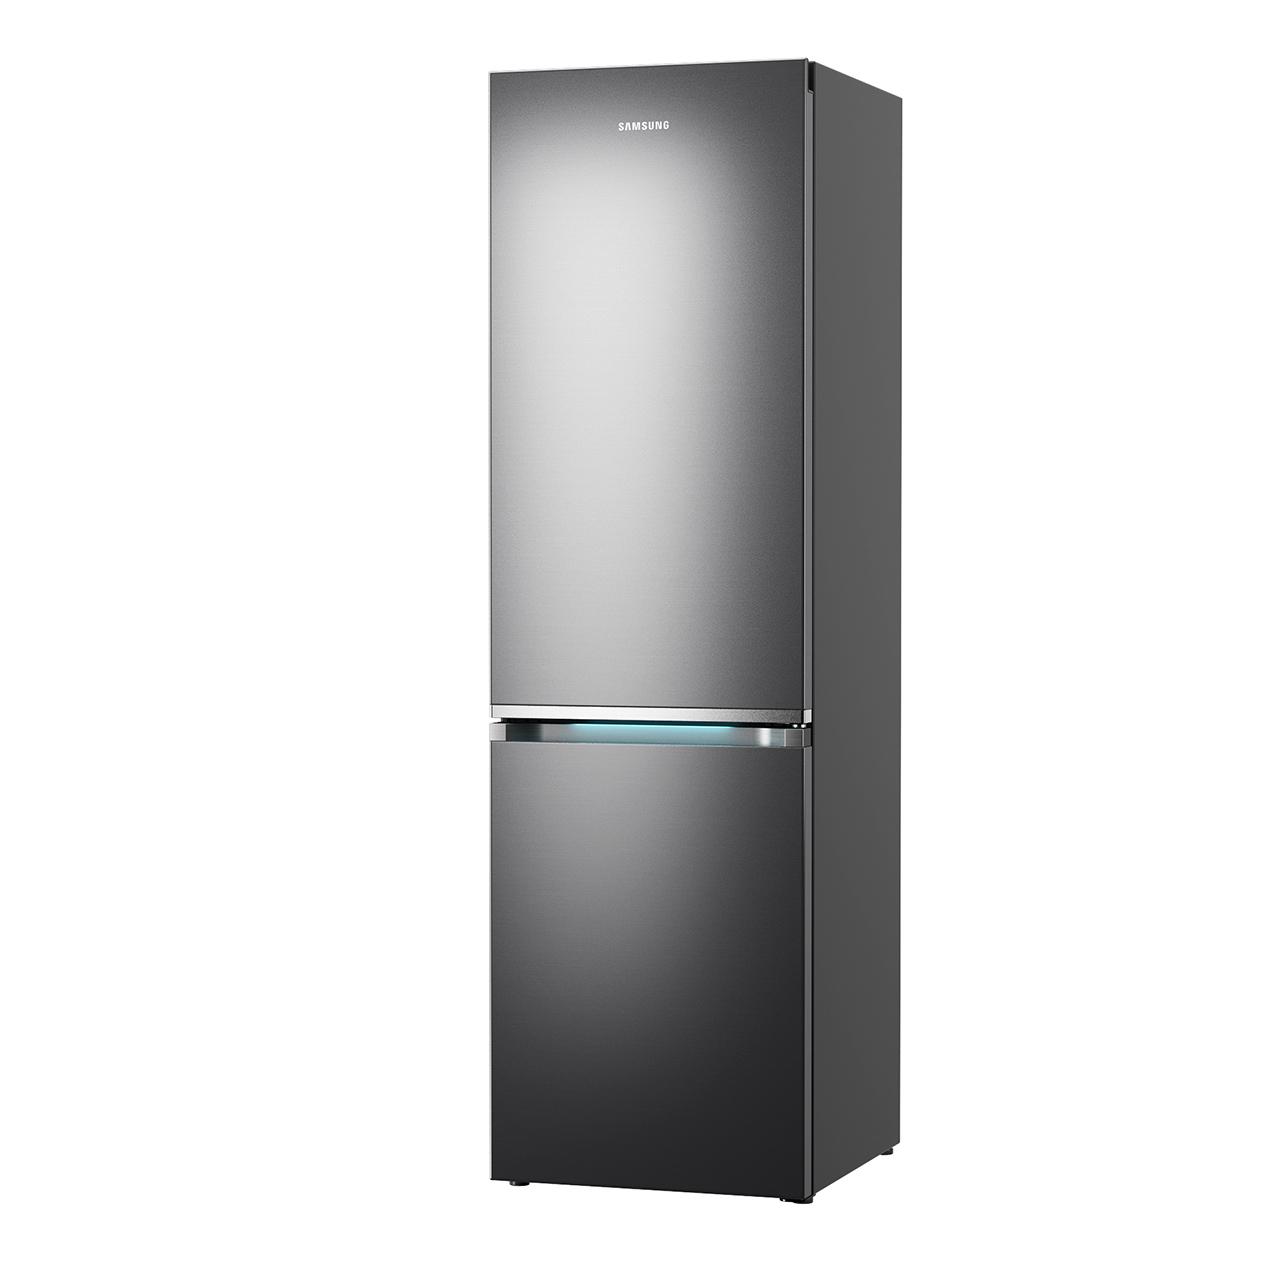 RB8000 Fridge-Freezer 202 cm by Samsung